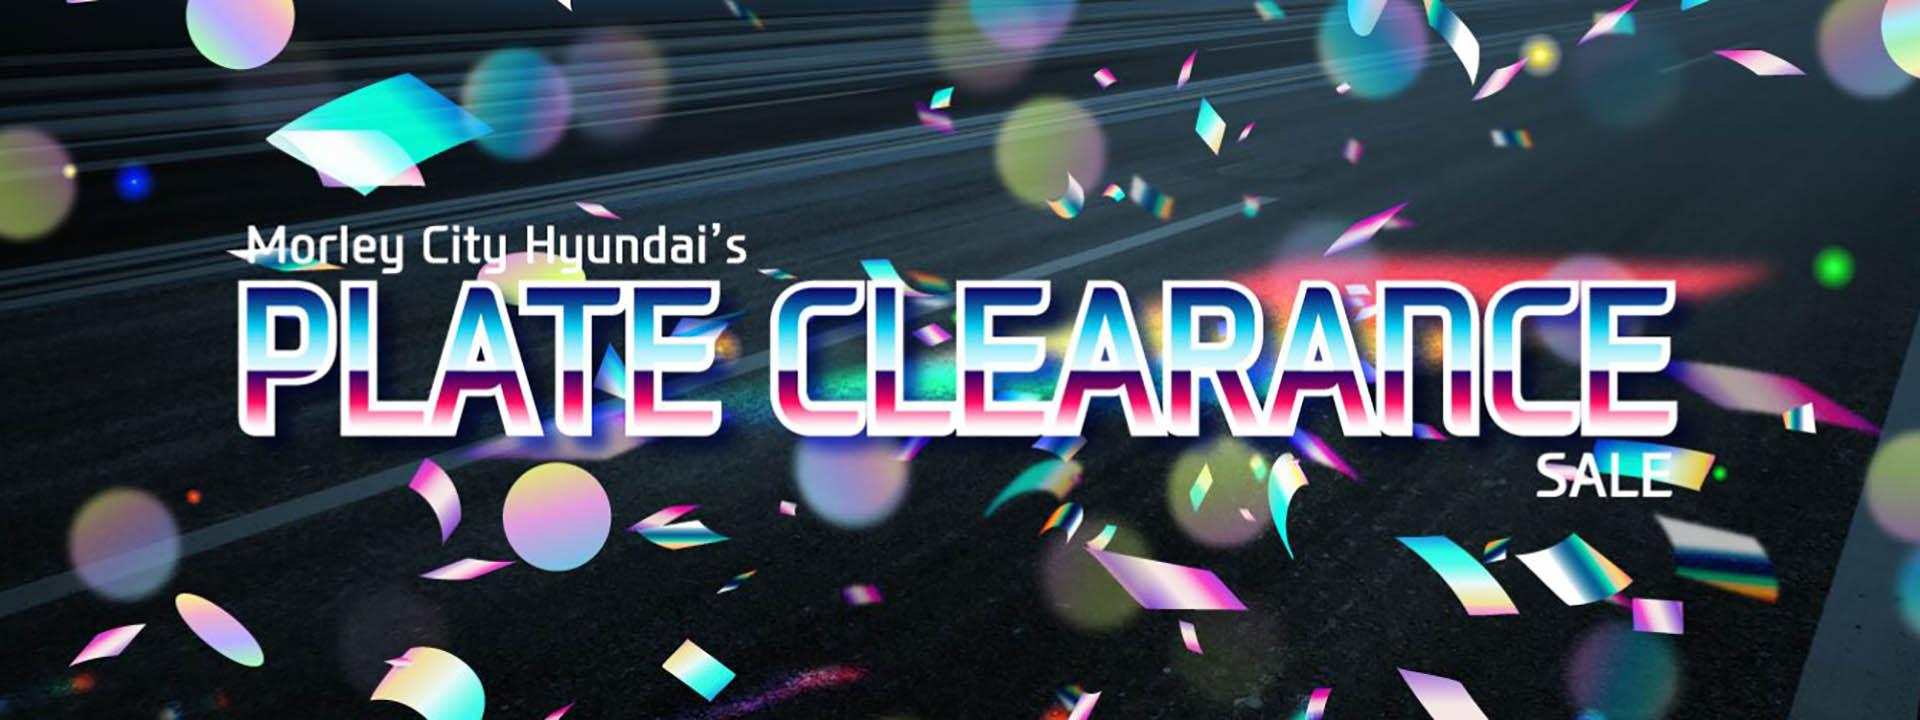 Morley City Hyundai's Plate Clearance